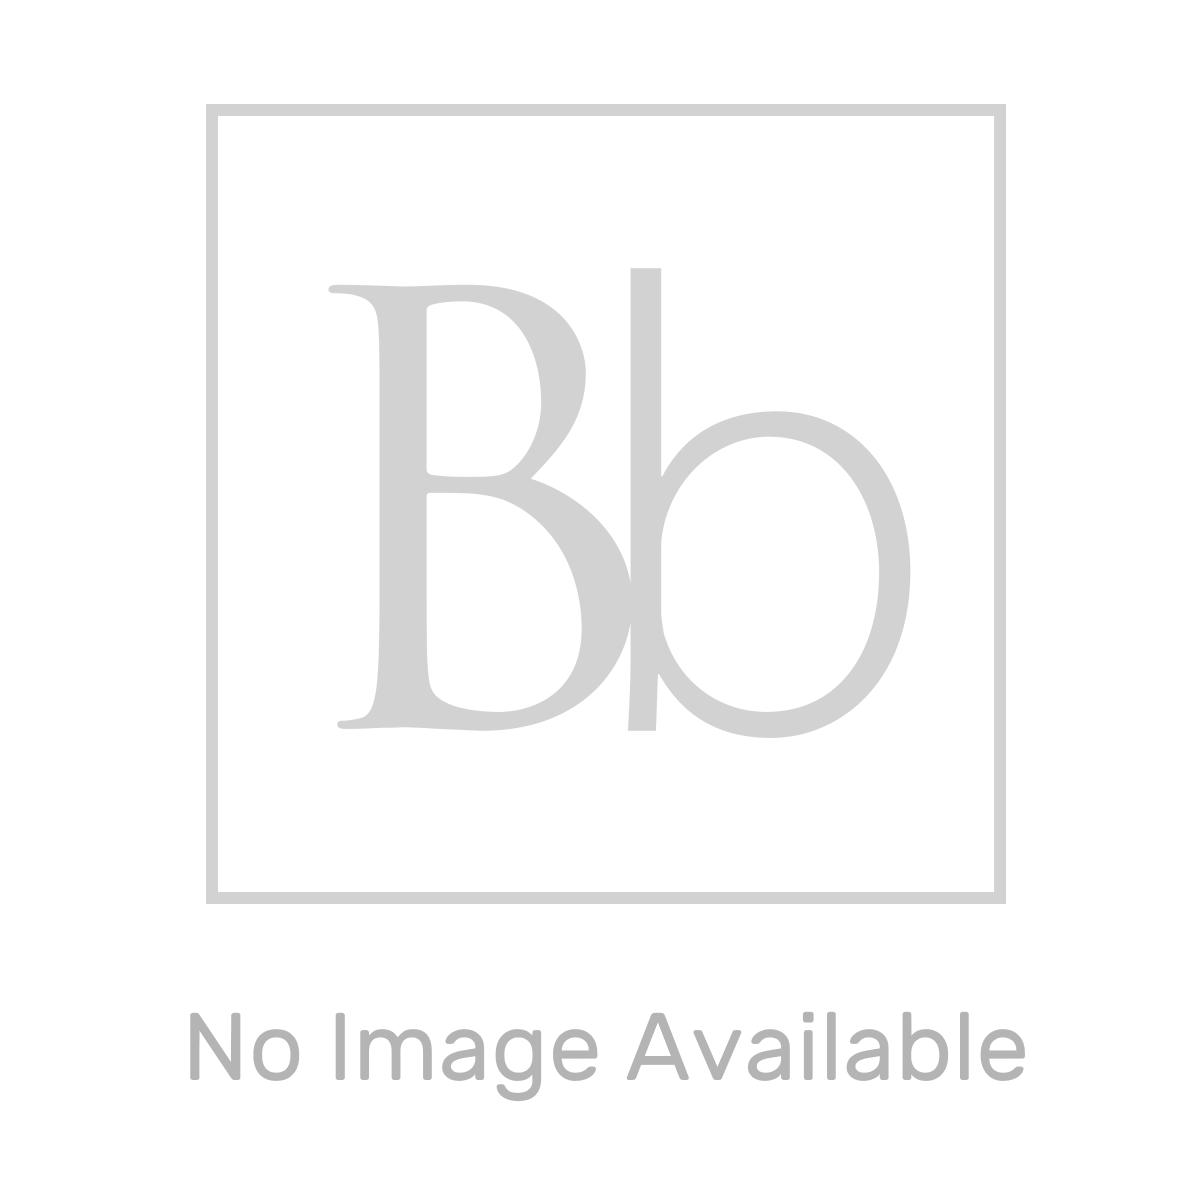 RAK Luce Translucent Onyx Ivory Full Lappato Tile 1200 x 2600mm